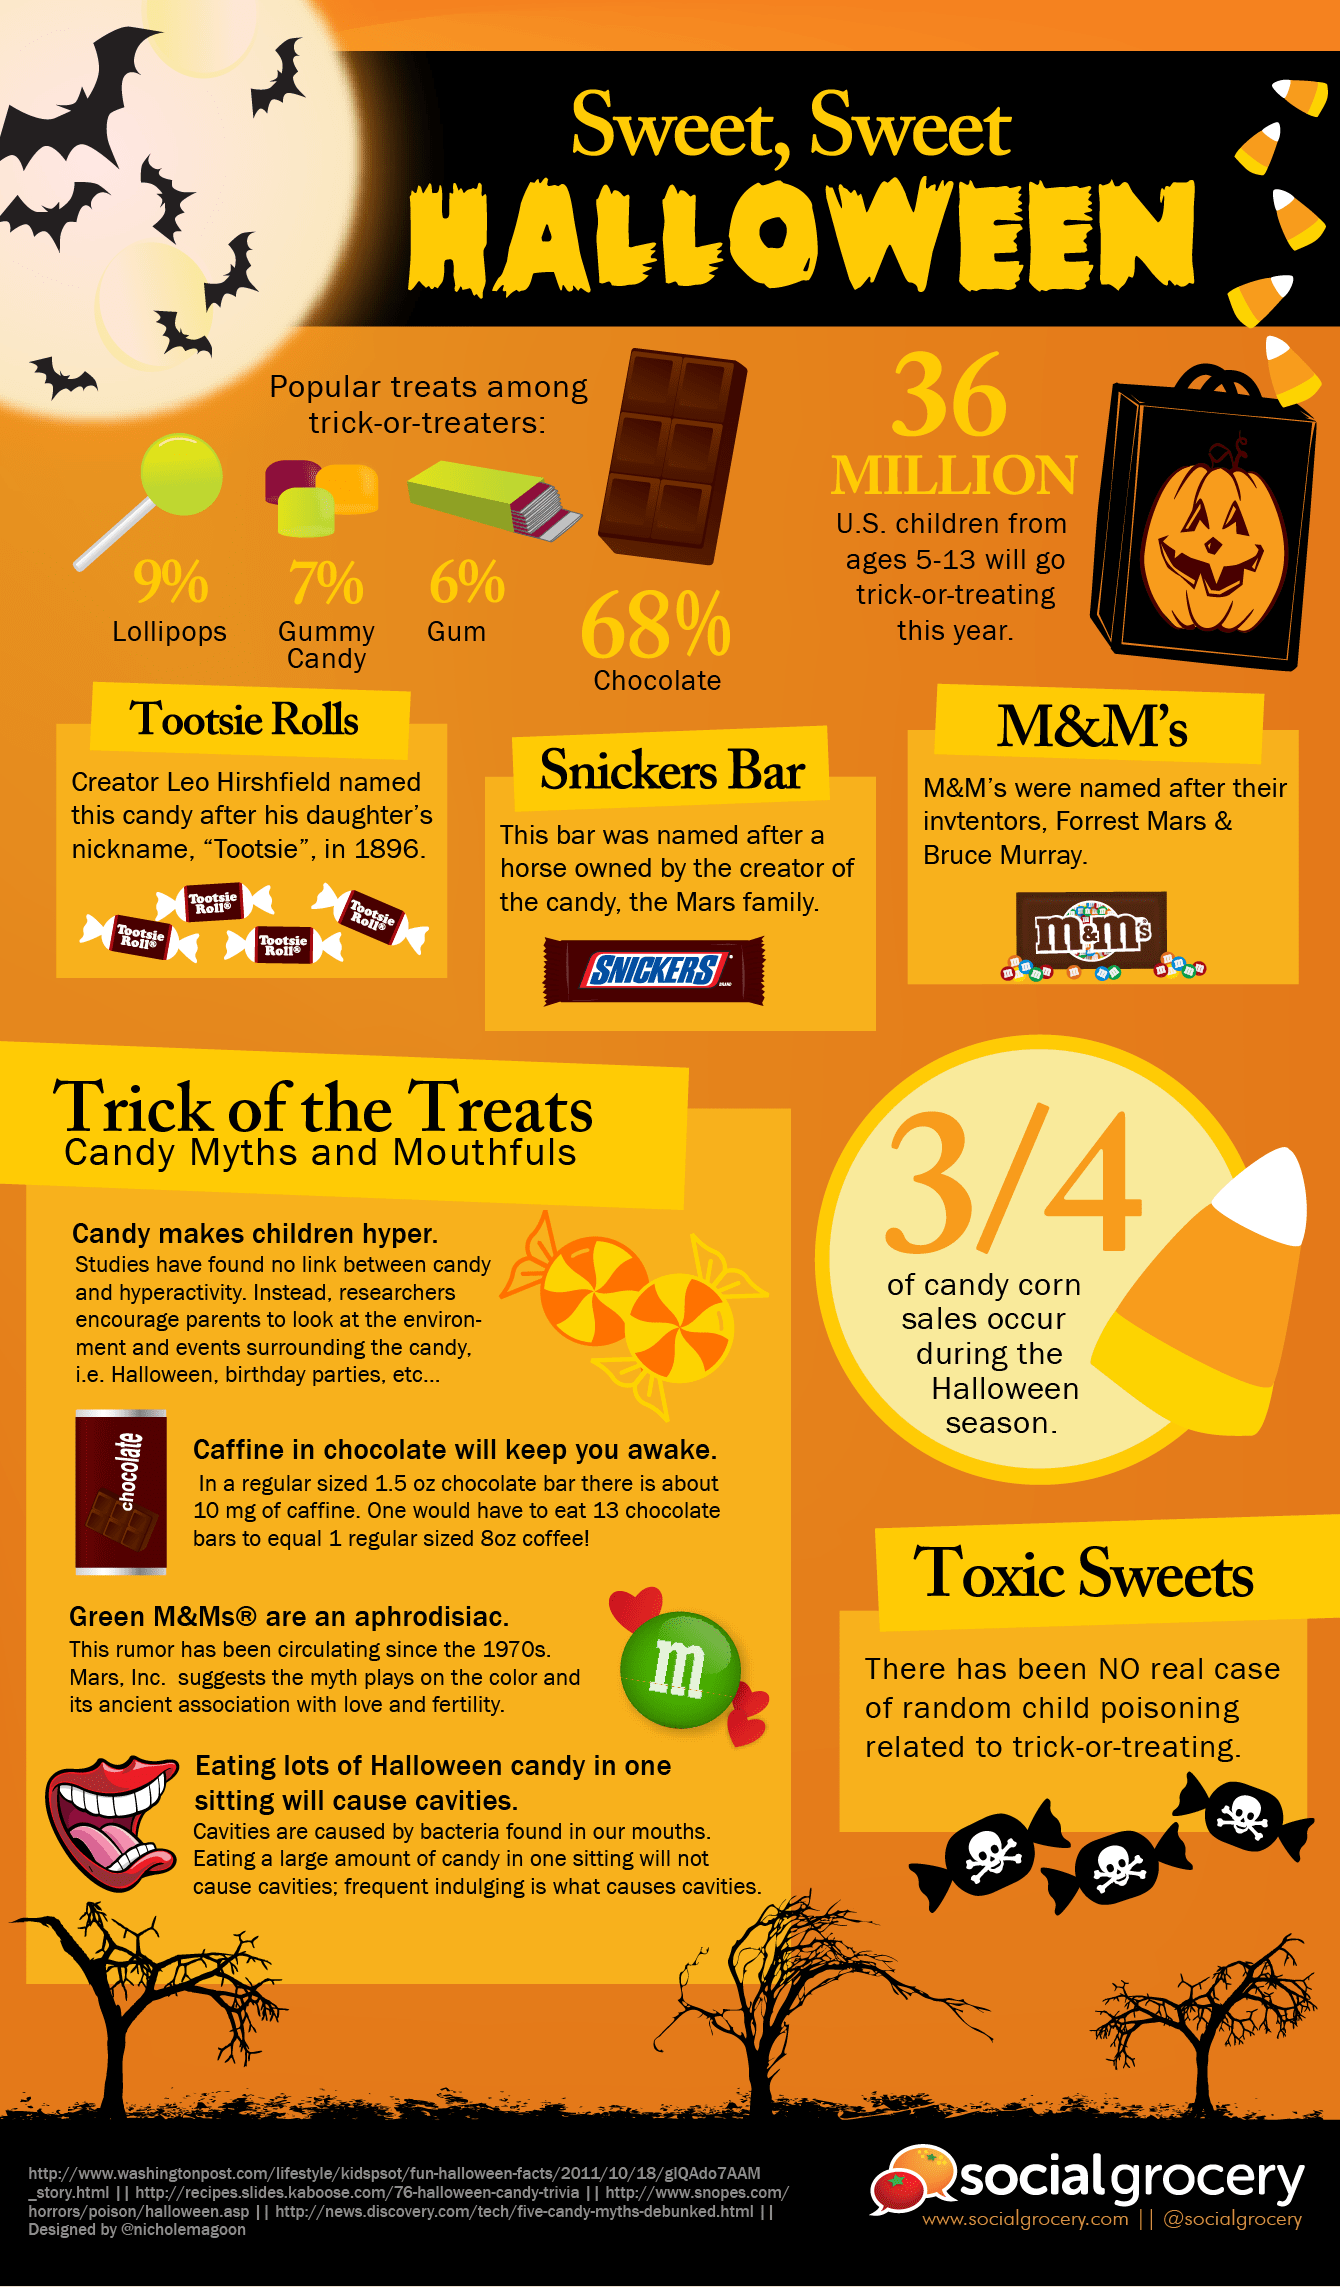 Sweet Sweet Halloween Infographic Infographic List